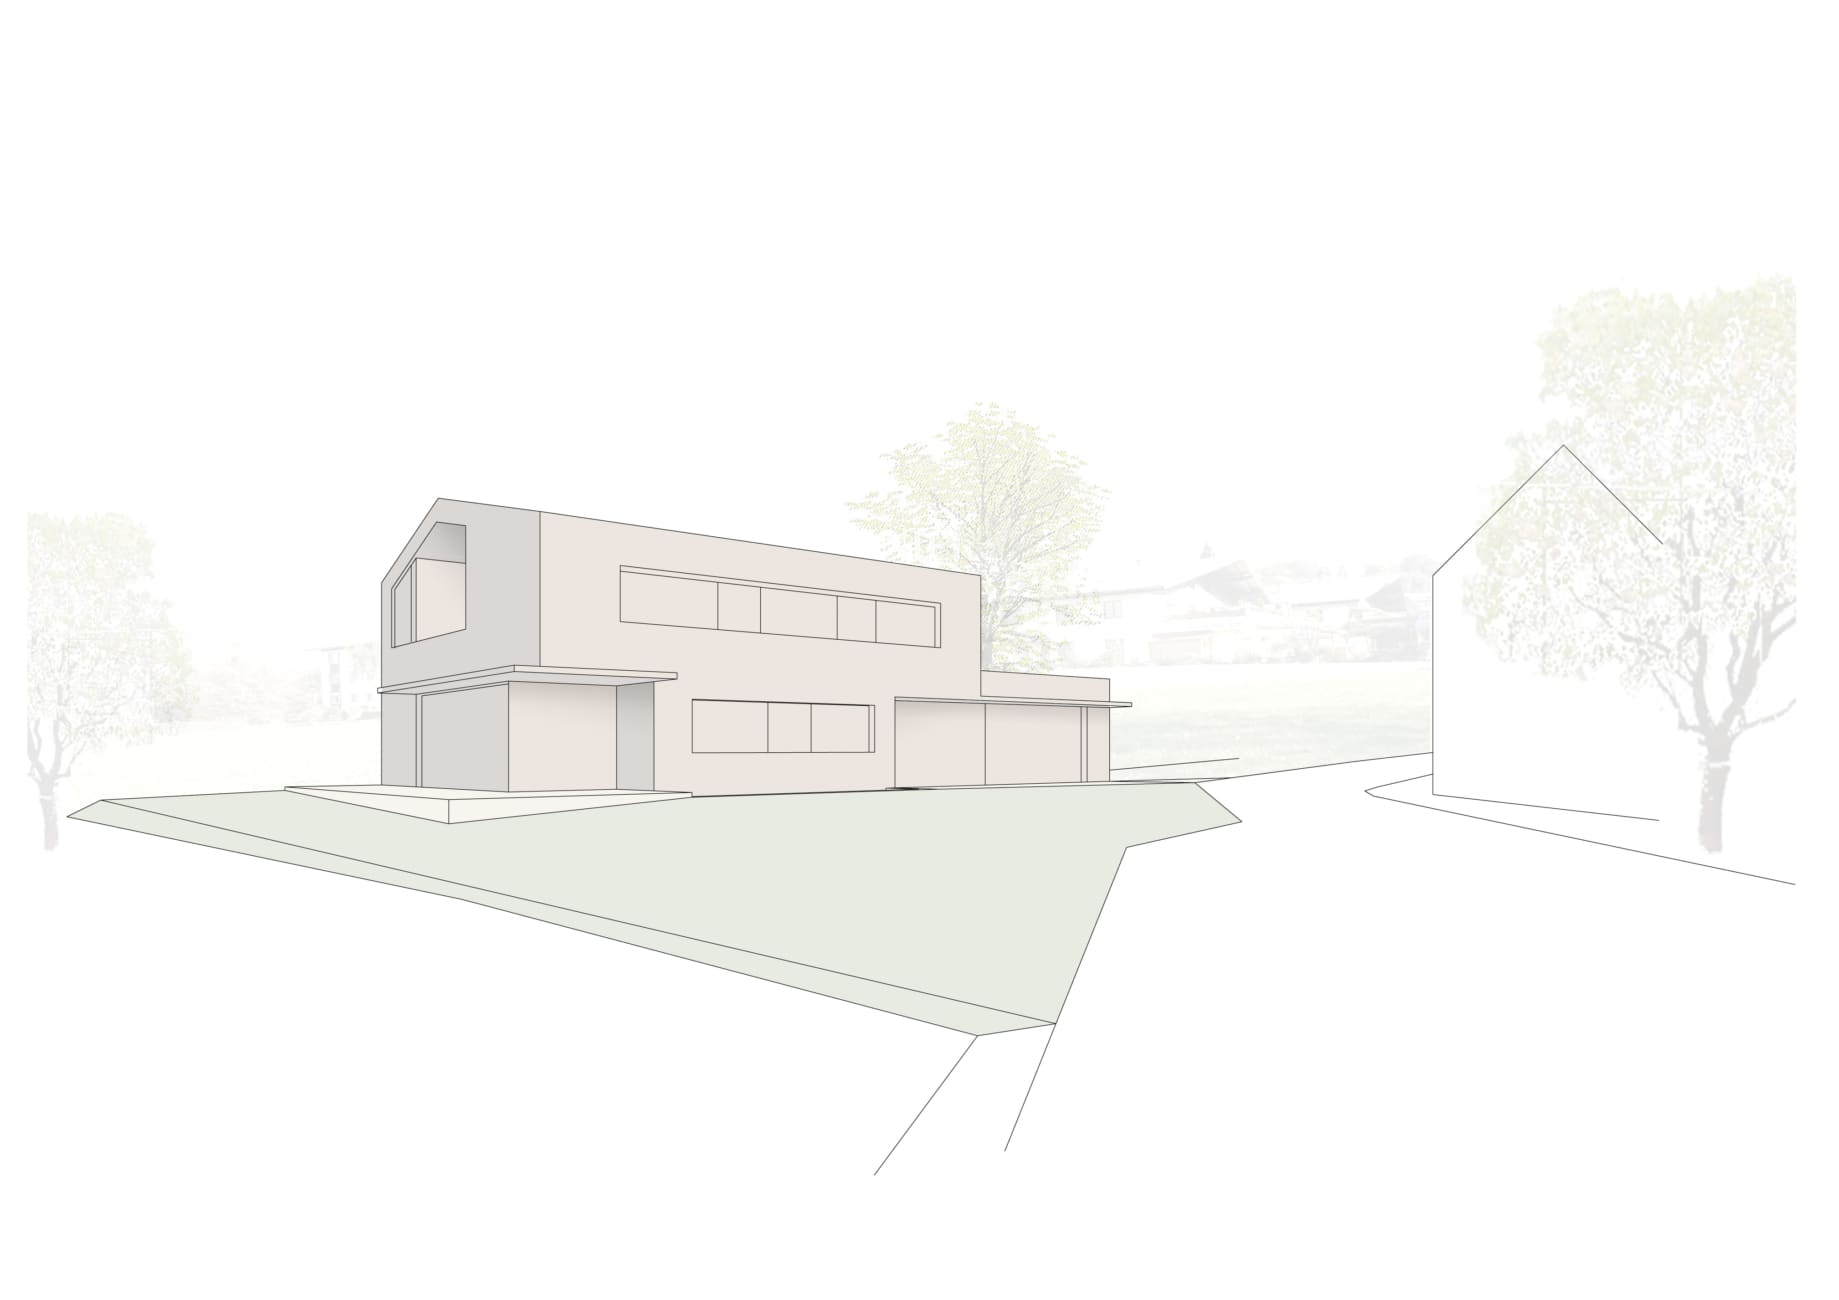 Holzhaus, Architektenhaus, Familie, Bach, Pool, Holzbau, Klavierraum, Landleben, Landhaus